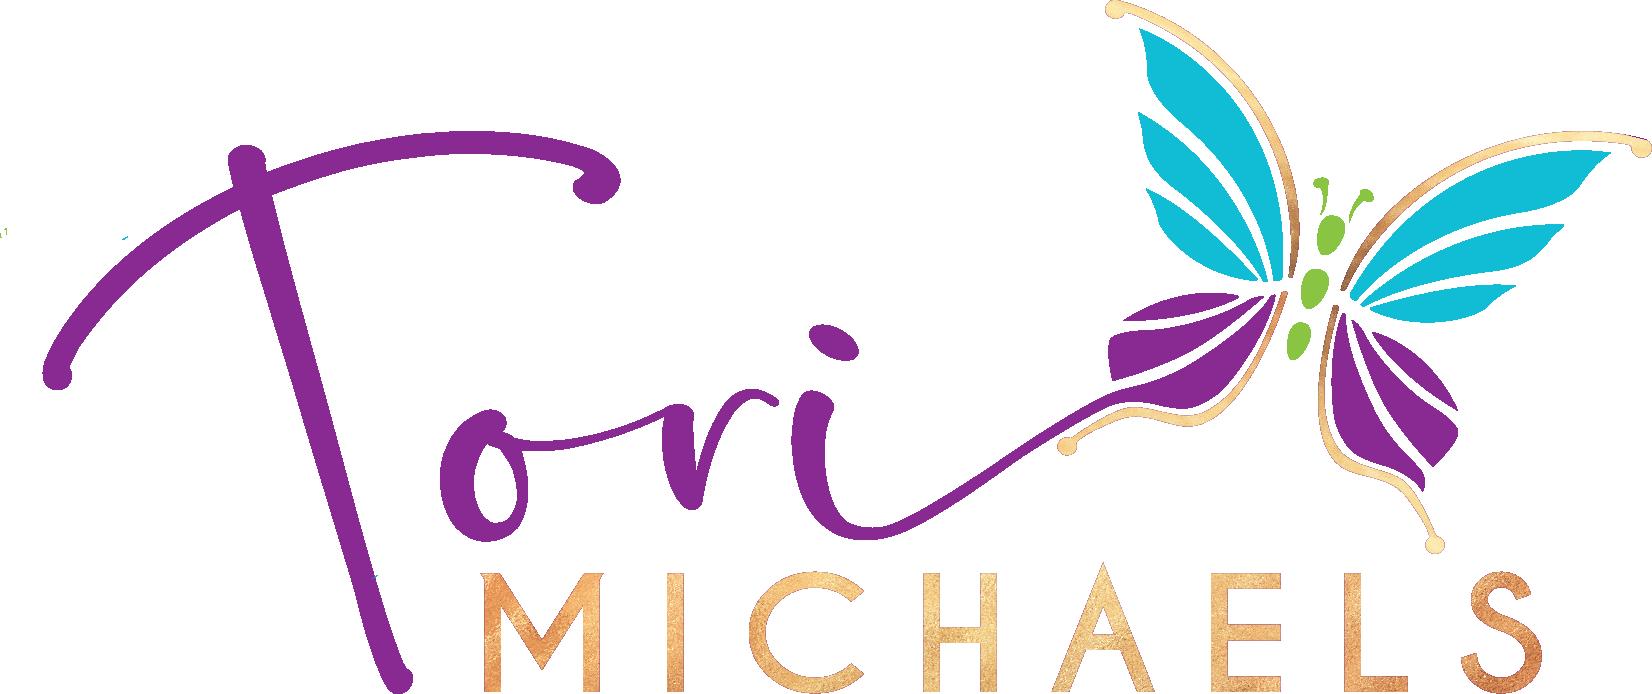 Tori Michaels